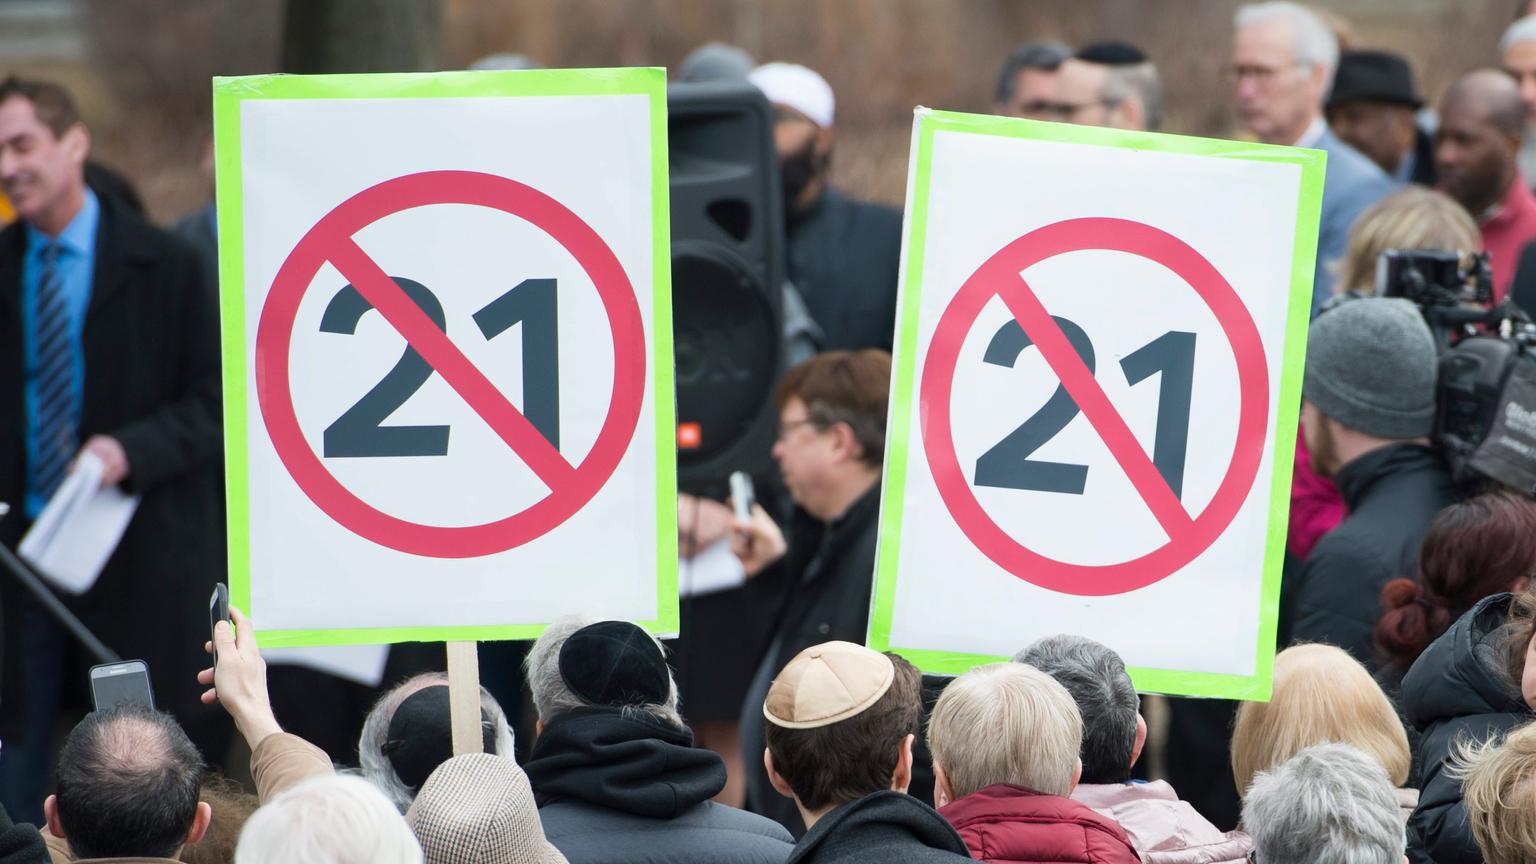 ▶️ Trudeau Challenges Jagmeet Singh Over Quebec Secularism Law